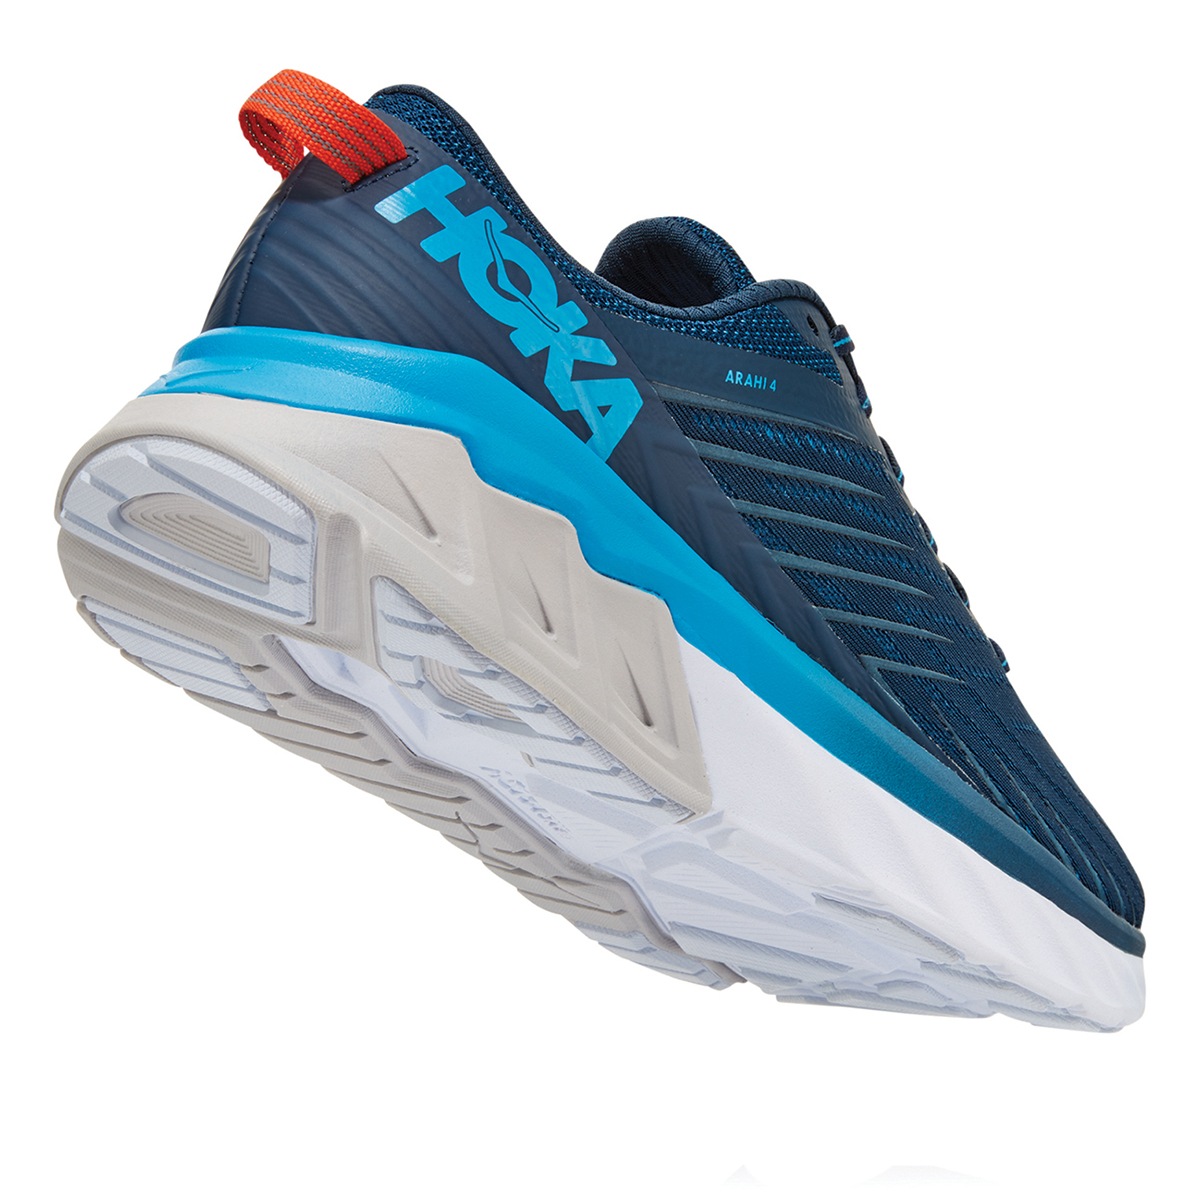 Men's Hoka One One Arahi 4 Running Shoe - Color: Majolica Blue/Dresden Blue (Regular Width) - Size: 15, Majolica Blue/Dresden Blue, large, image 4